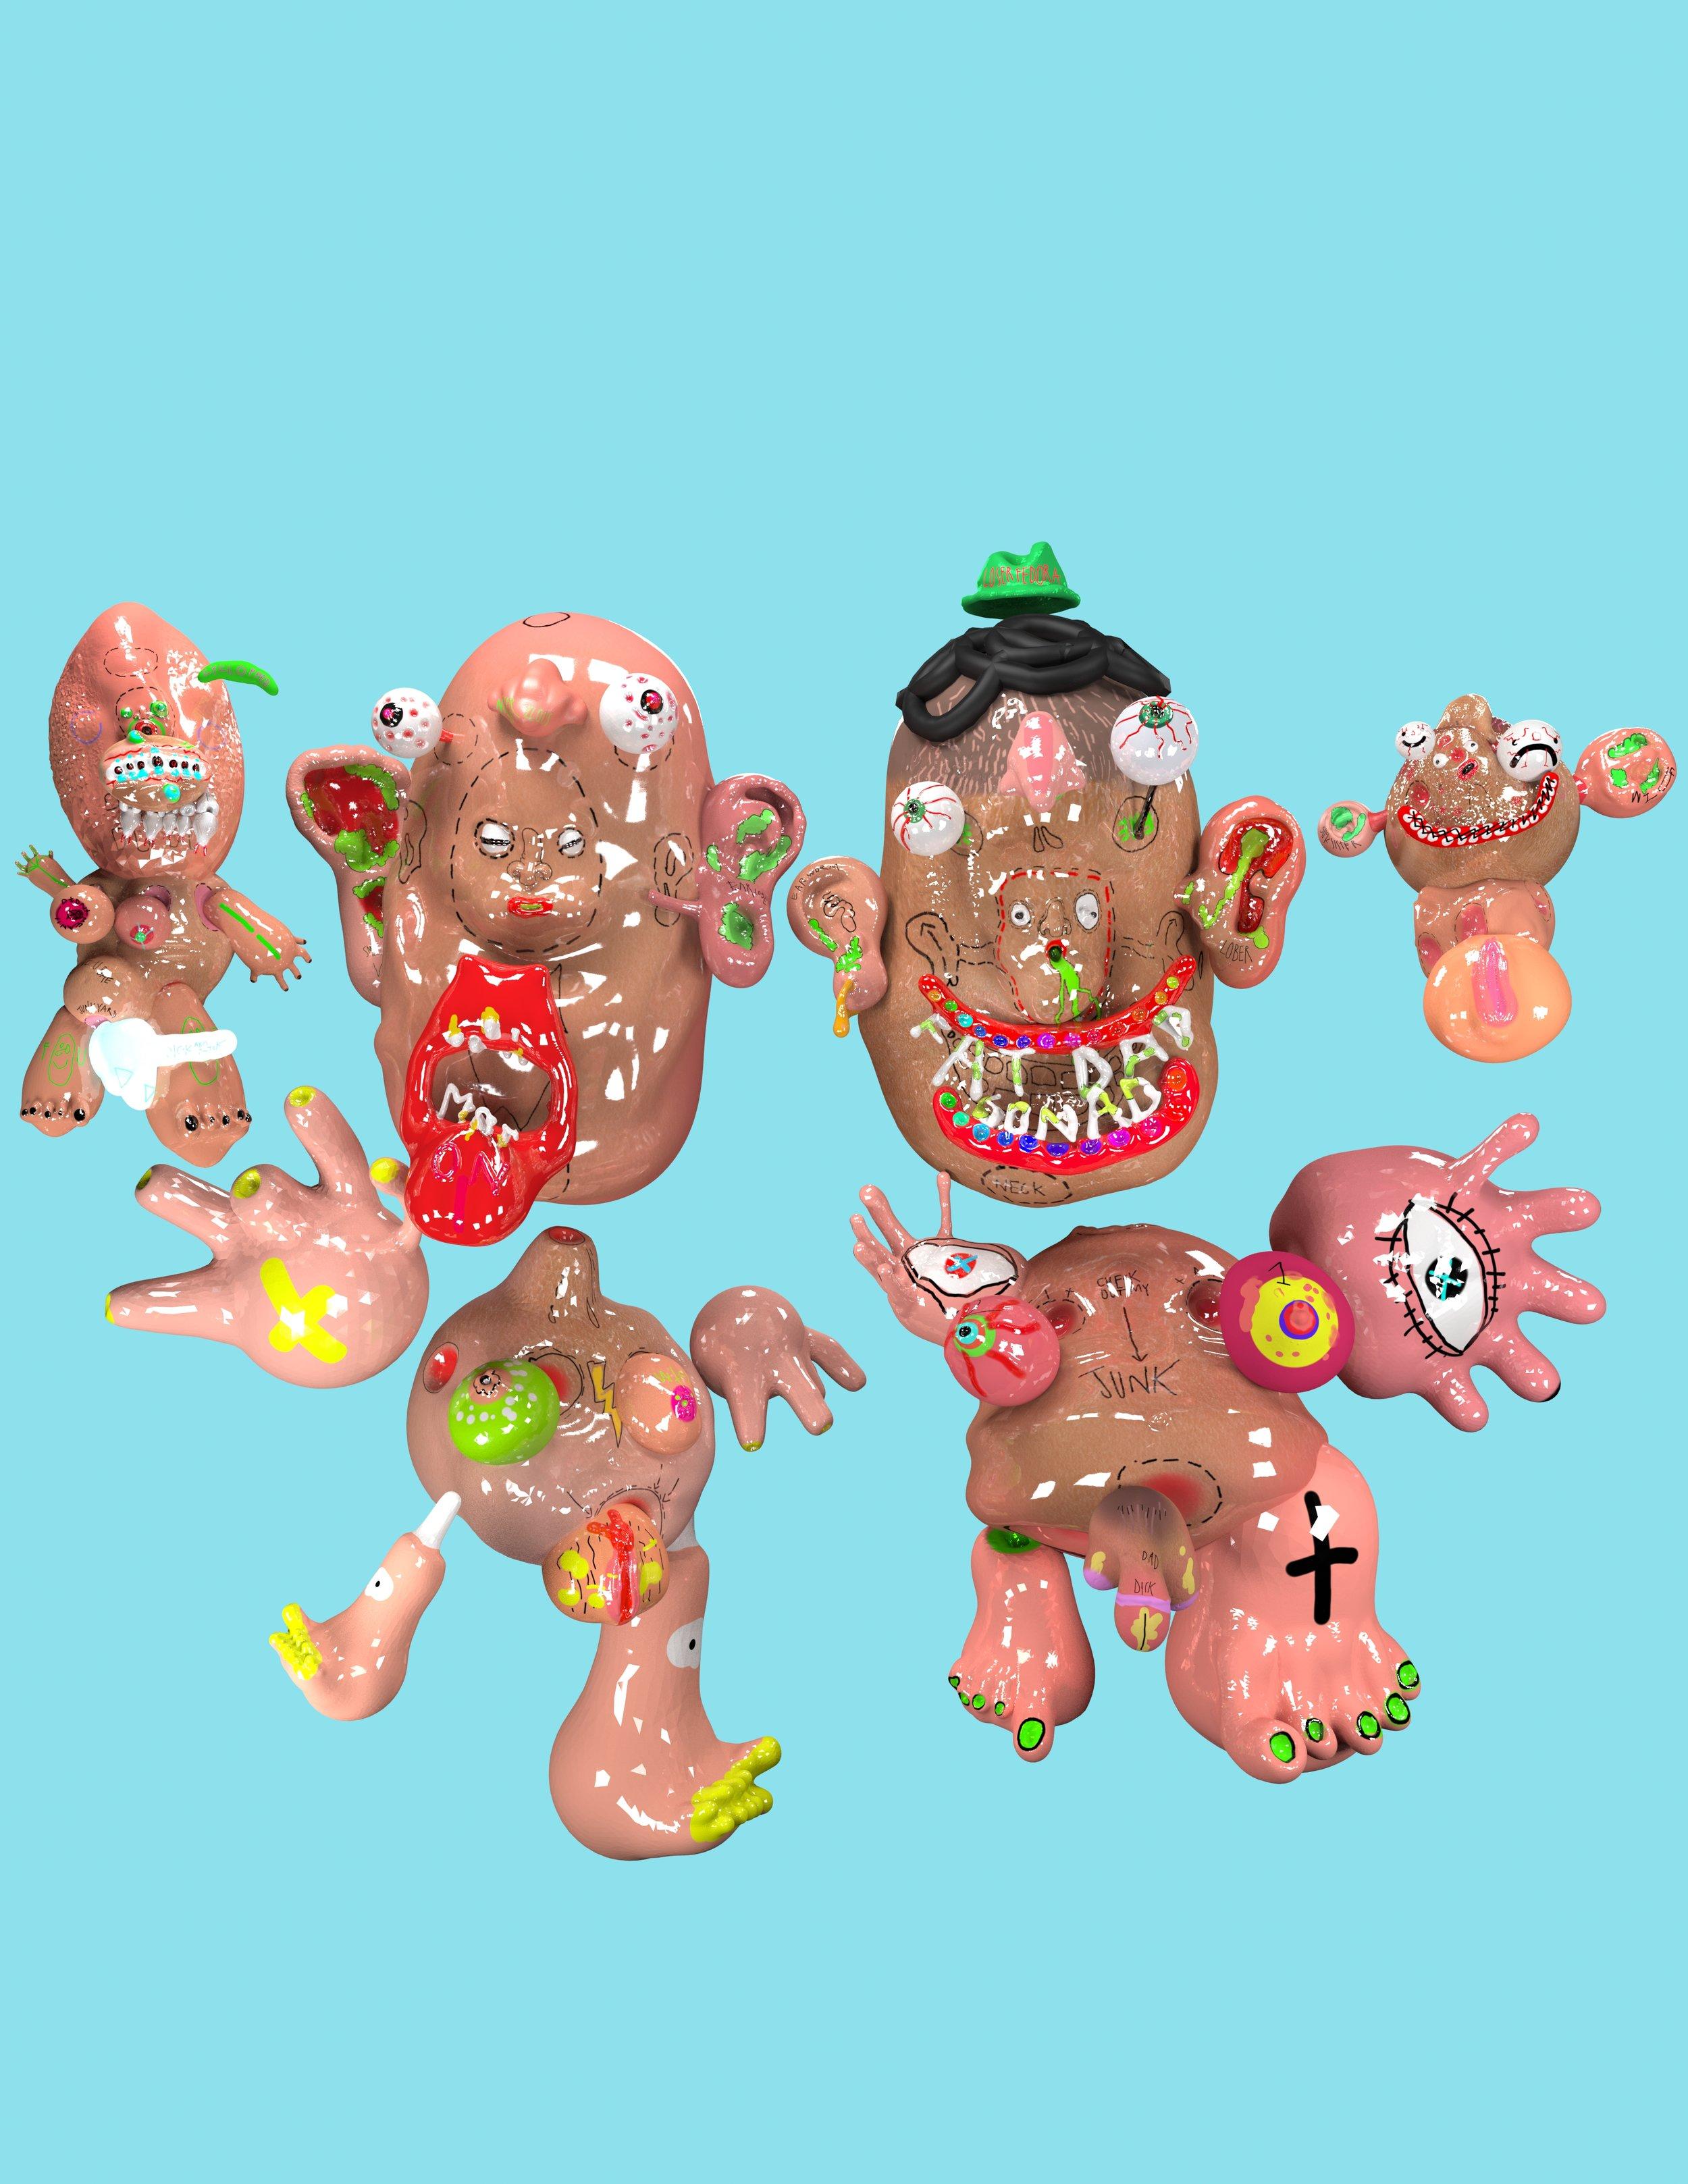 _The Lesser Known Potato Family.jpeg